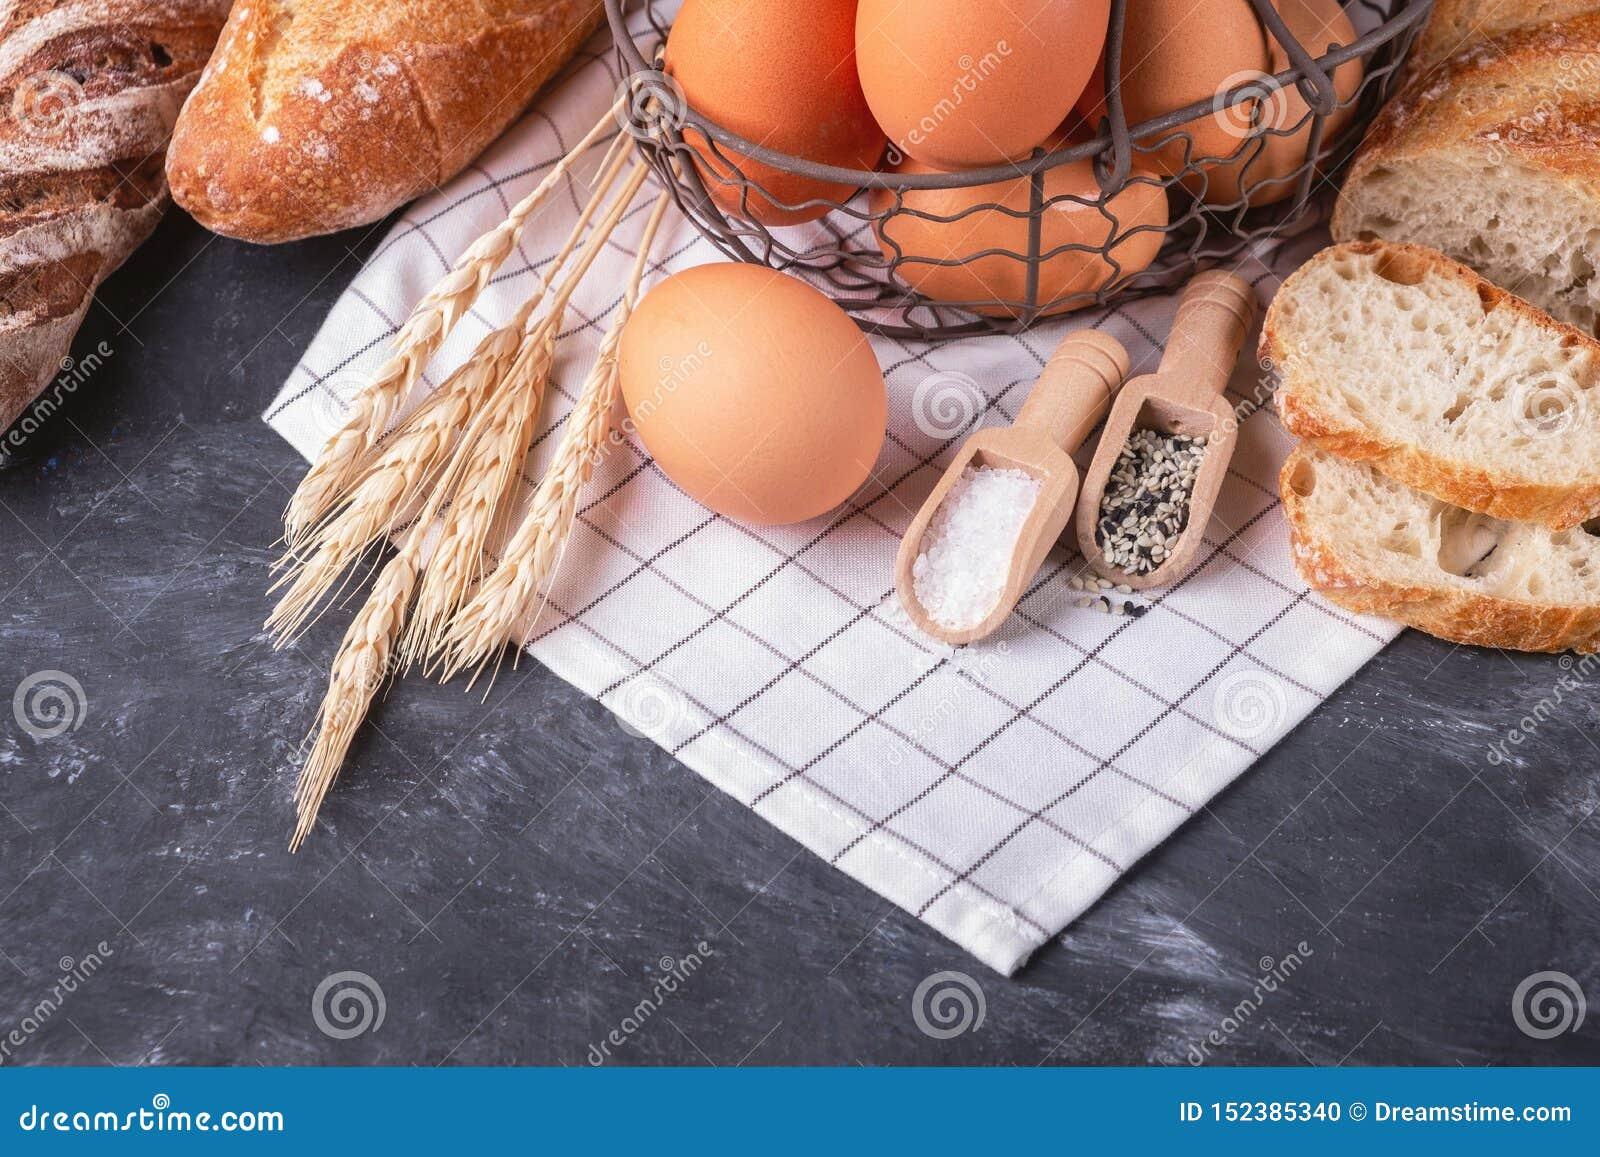 Assortment of fresh bread. Healthy homemade bread.